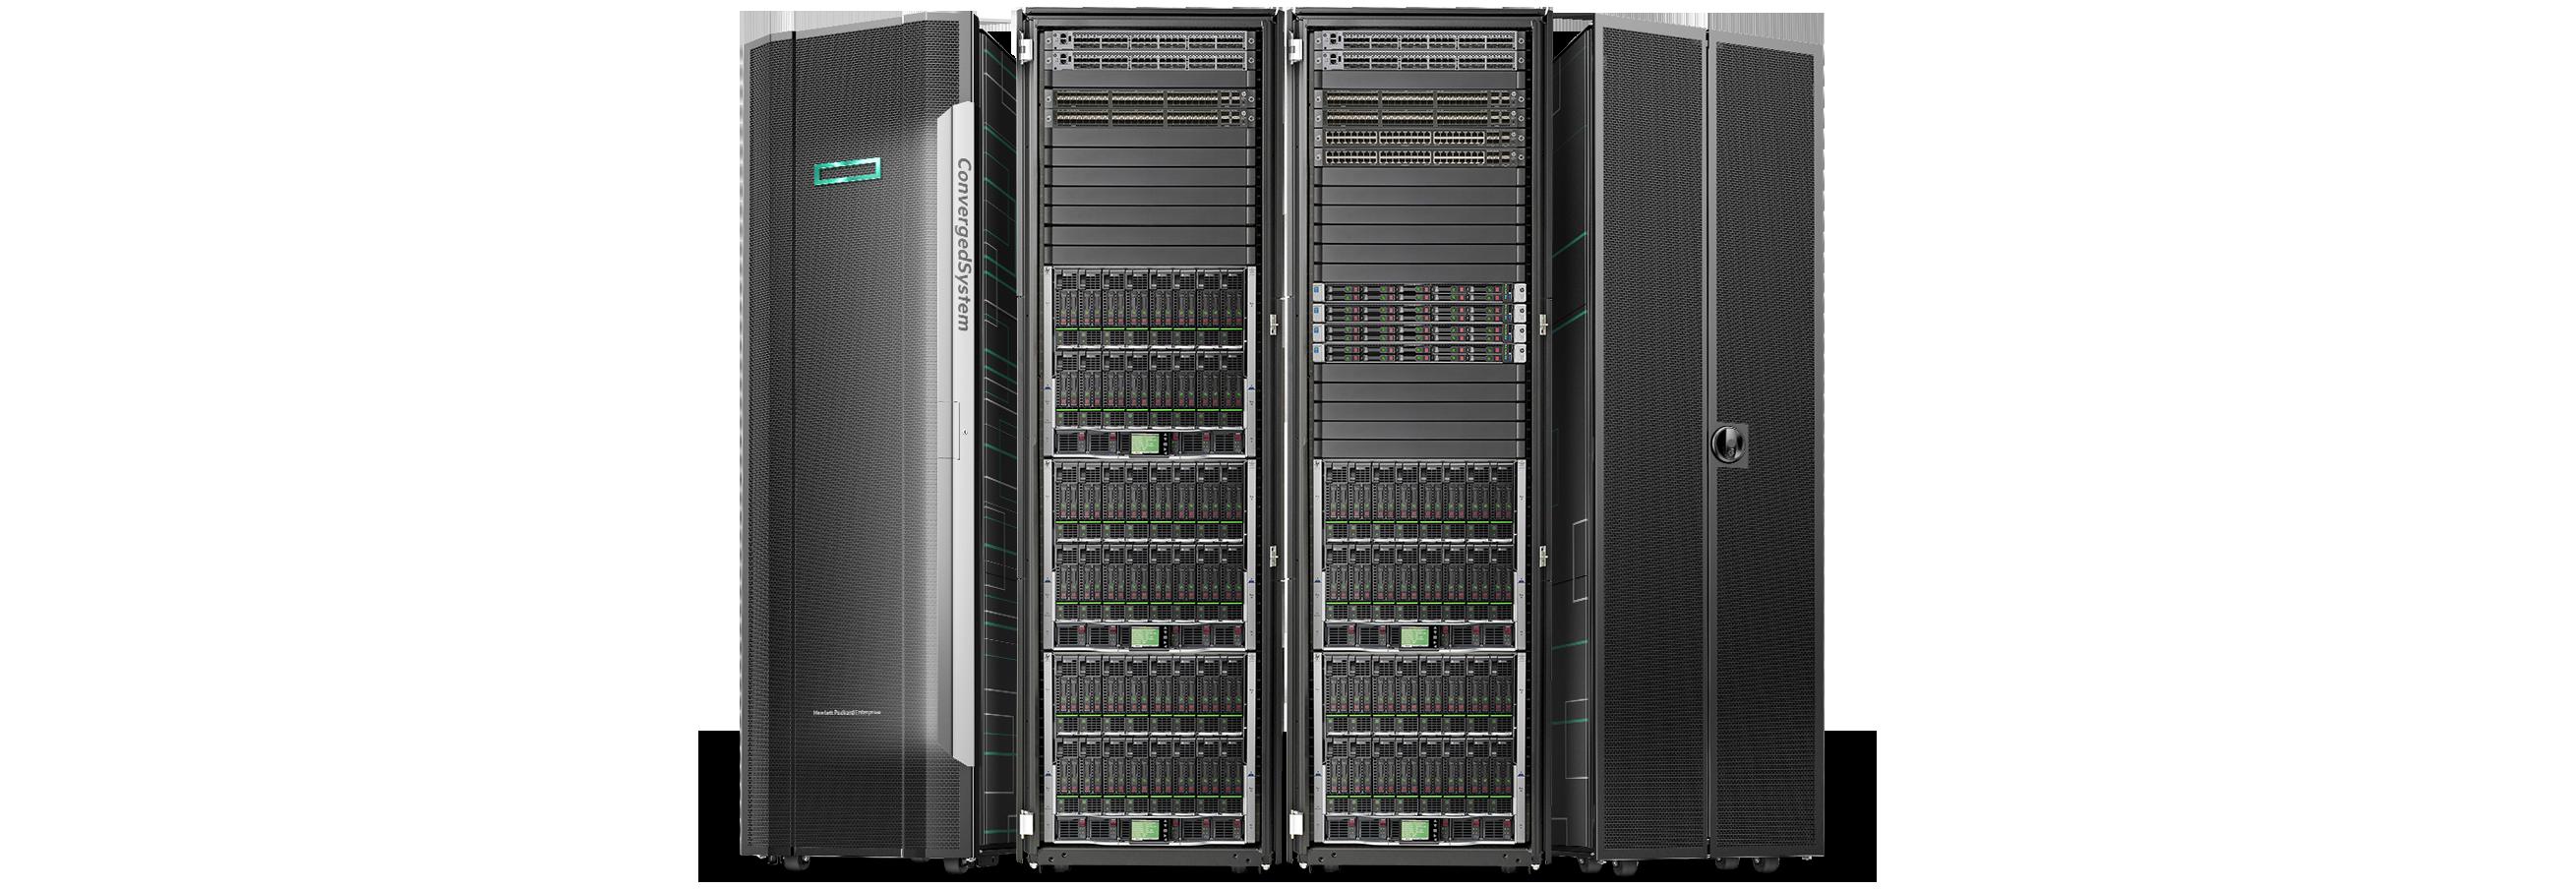 HPE ConvergedSystem